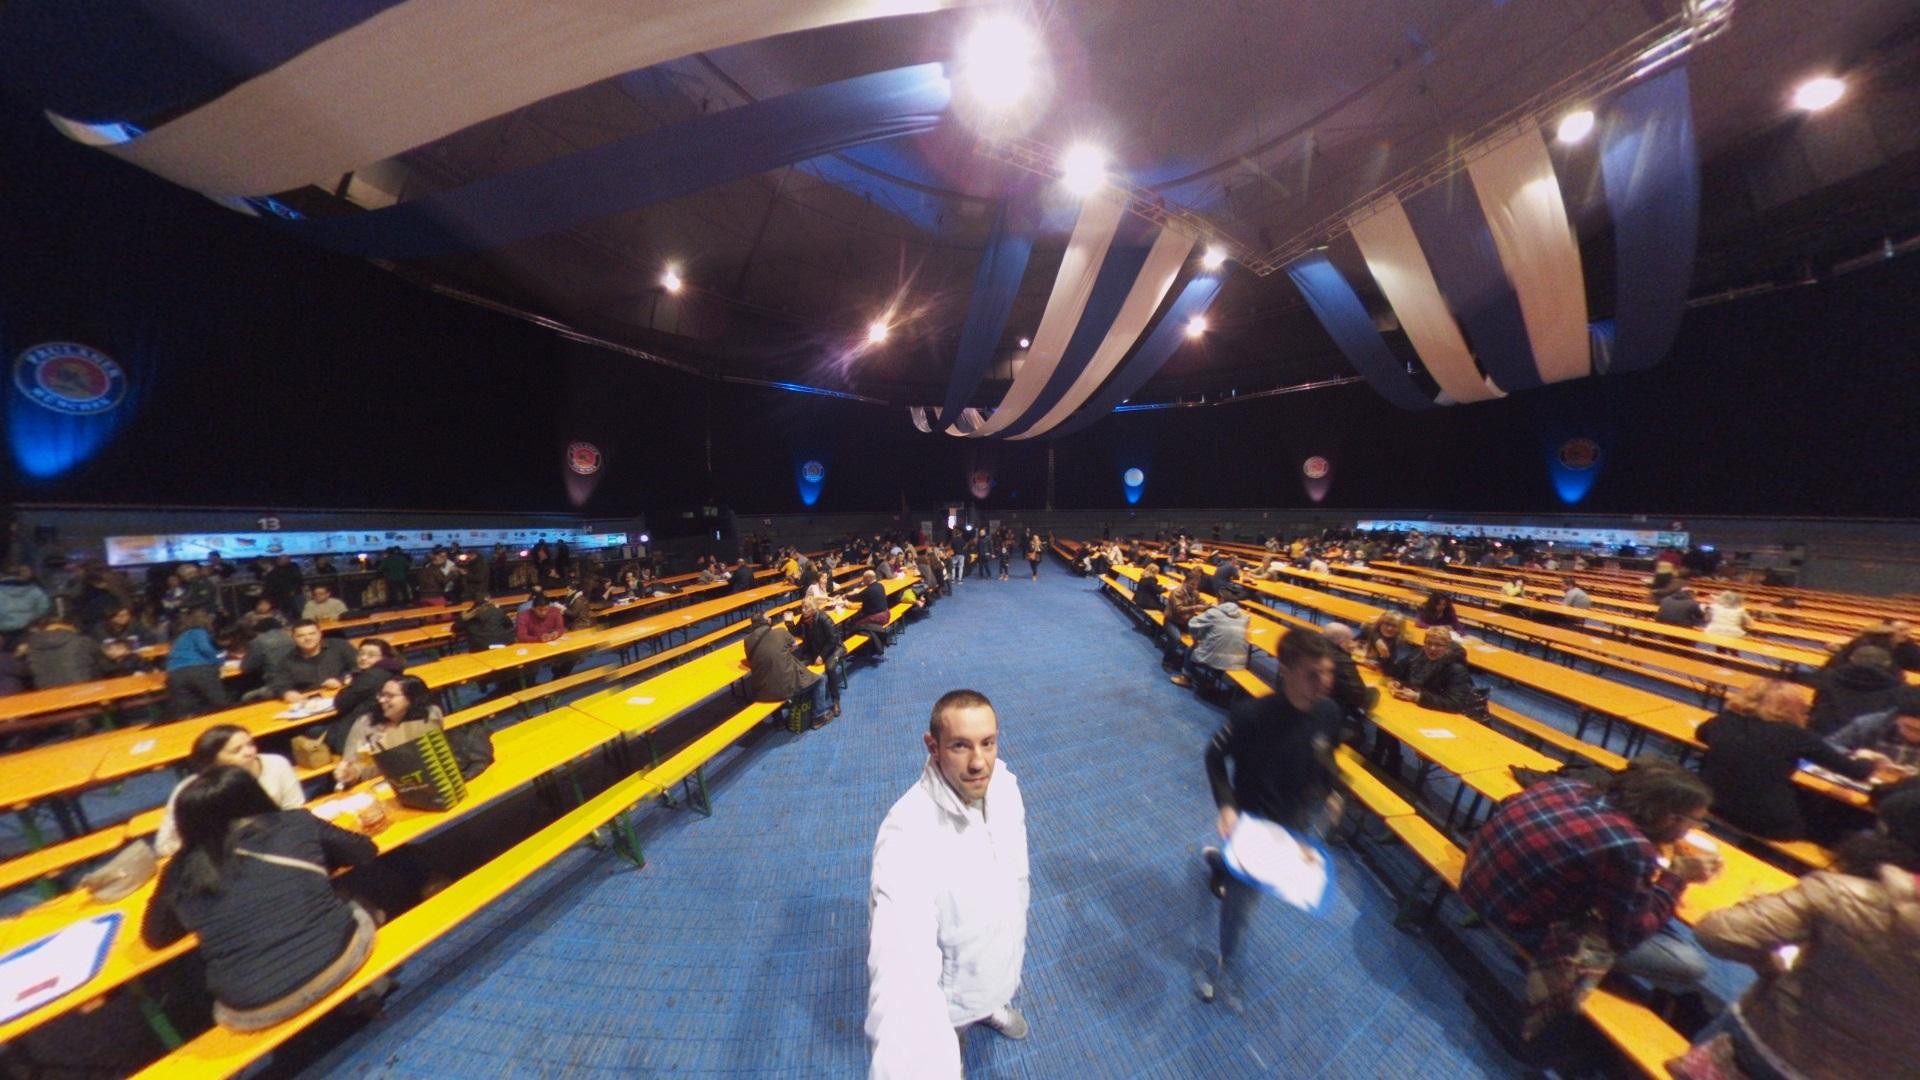 Fotos 360 Zona central de la feria de la cerveza.#VidePan en #FeriaCervezaMad